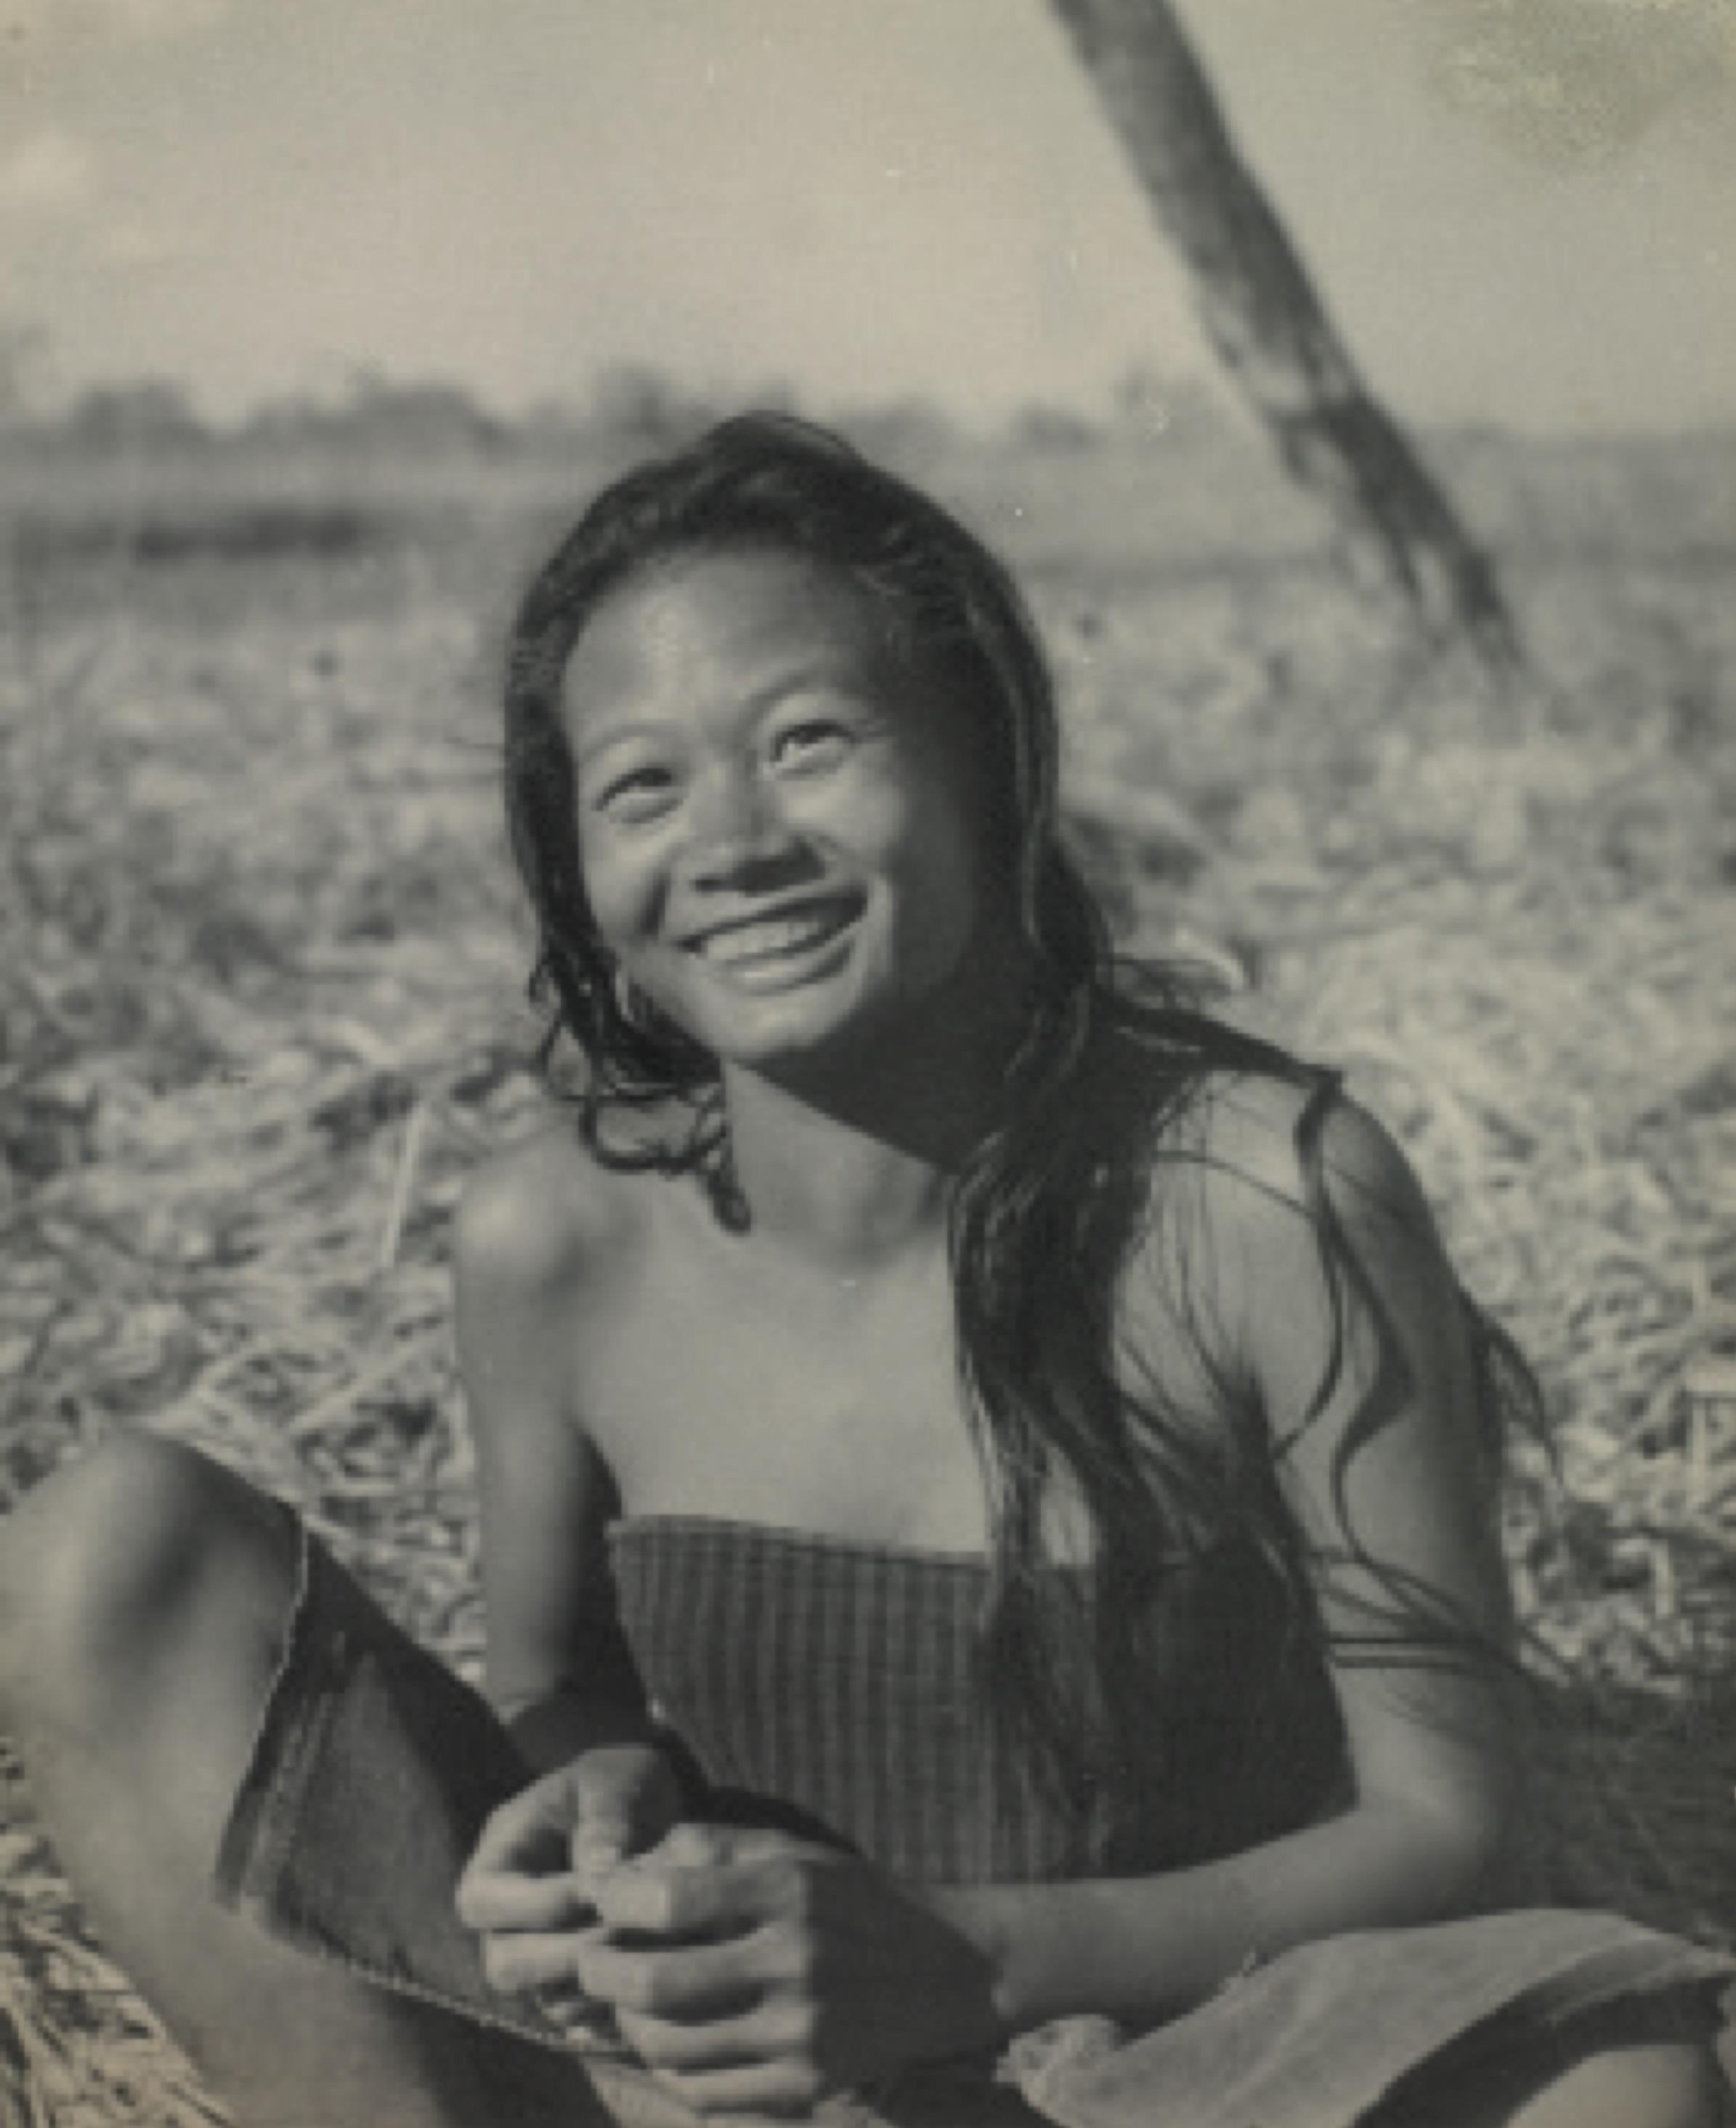 Mikir tribal girl, Assam. Credit: Sunil Janah. From the Swaraj Art Archive